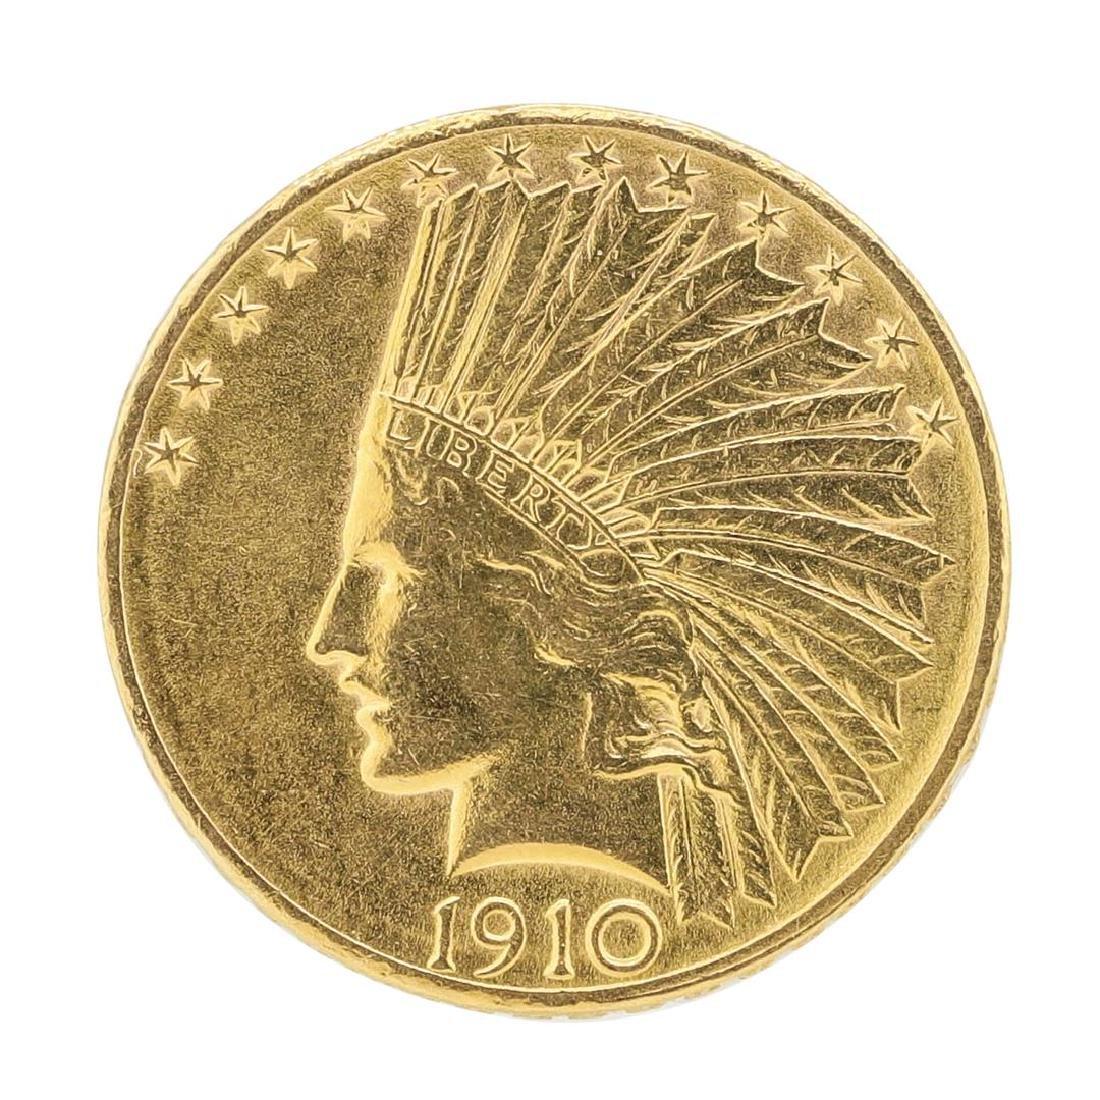 1910-D $10 Indian Head Eagle Gold Coin